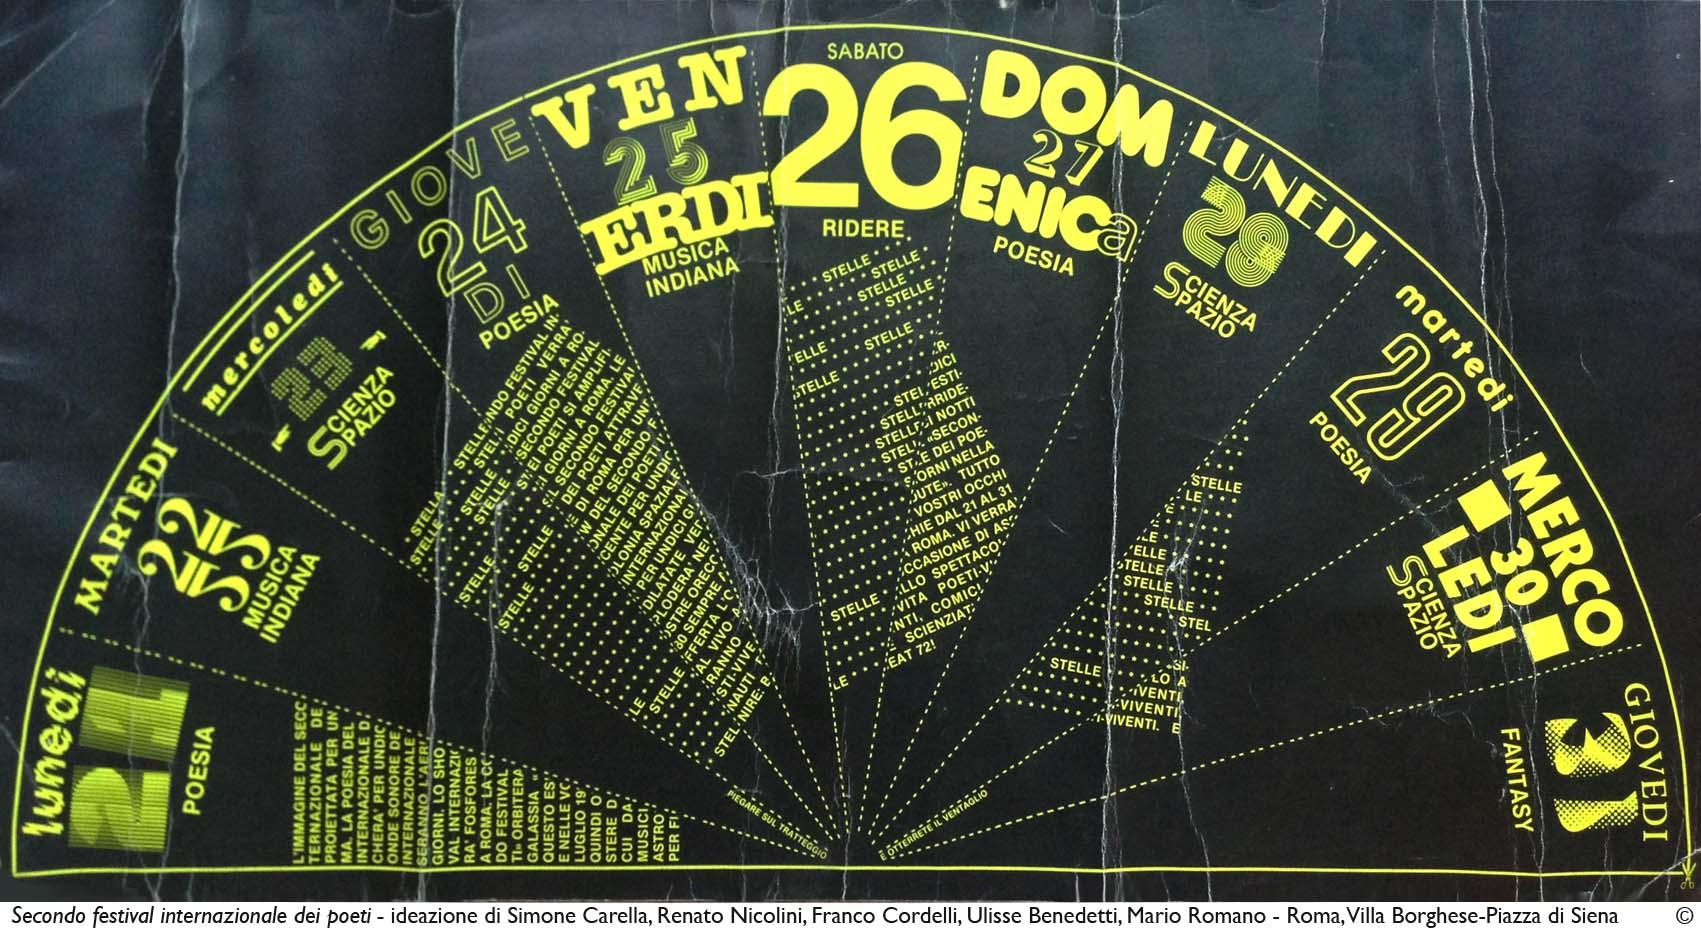 Secondo Festival dei Poeti_2 - 1980